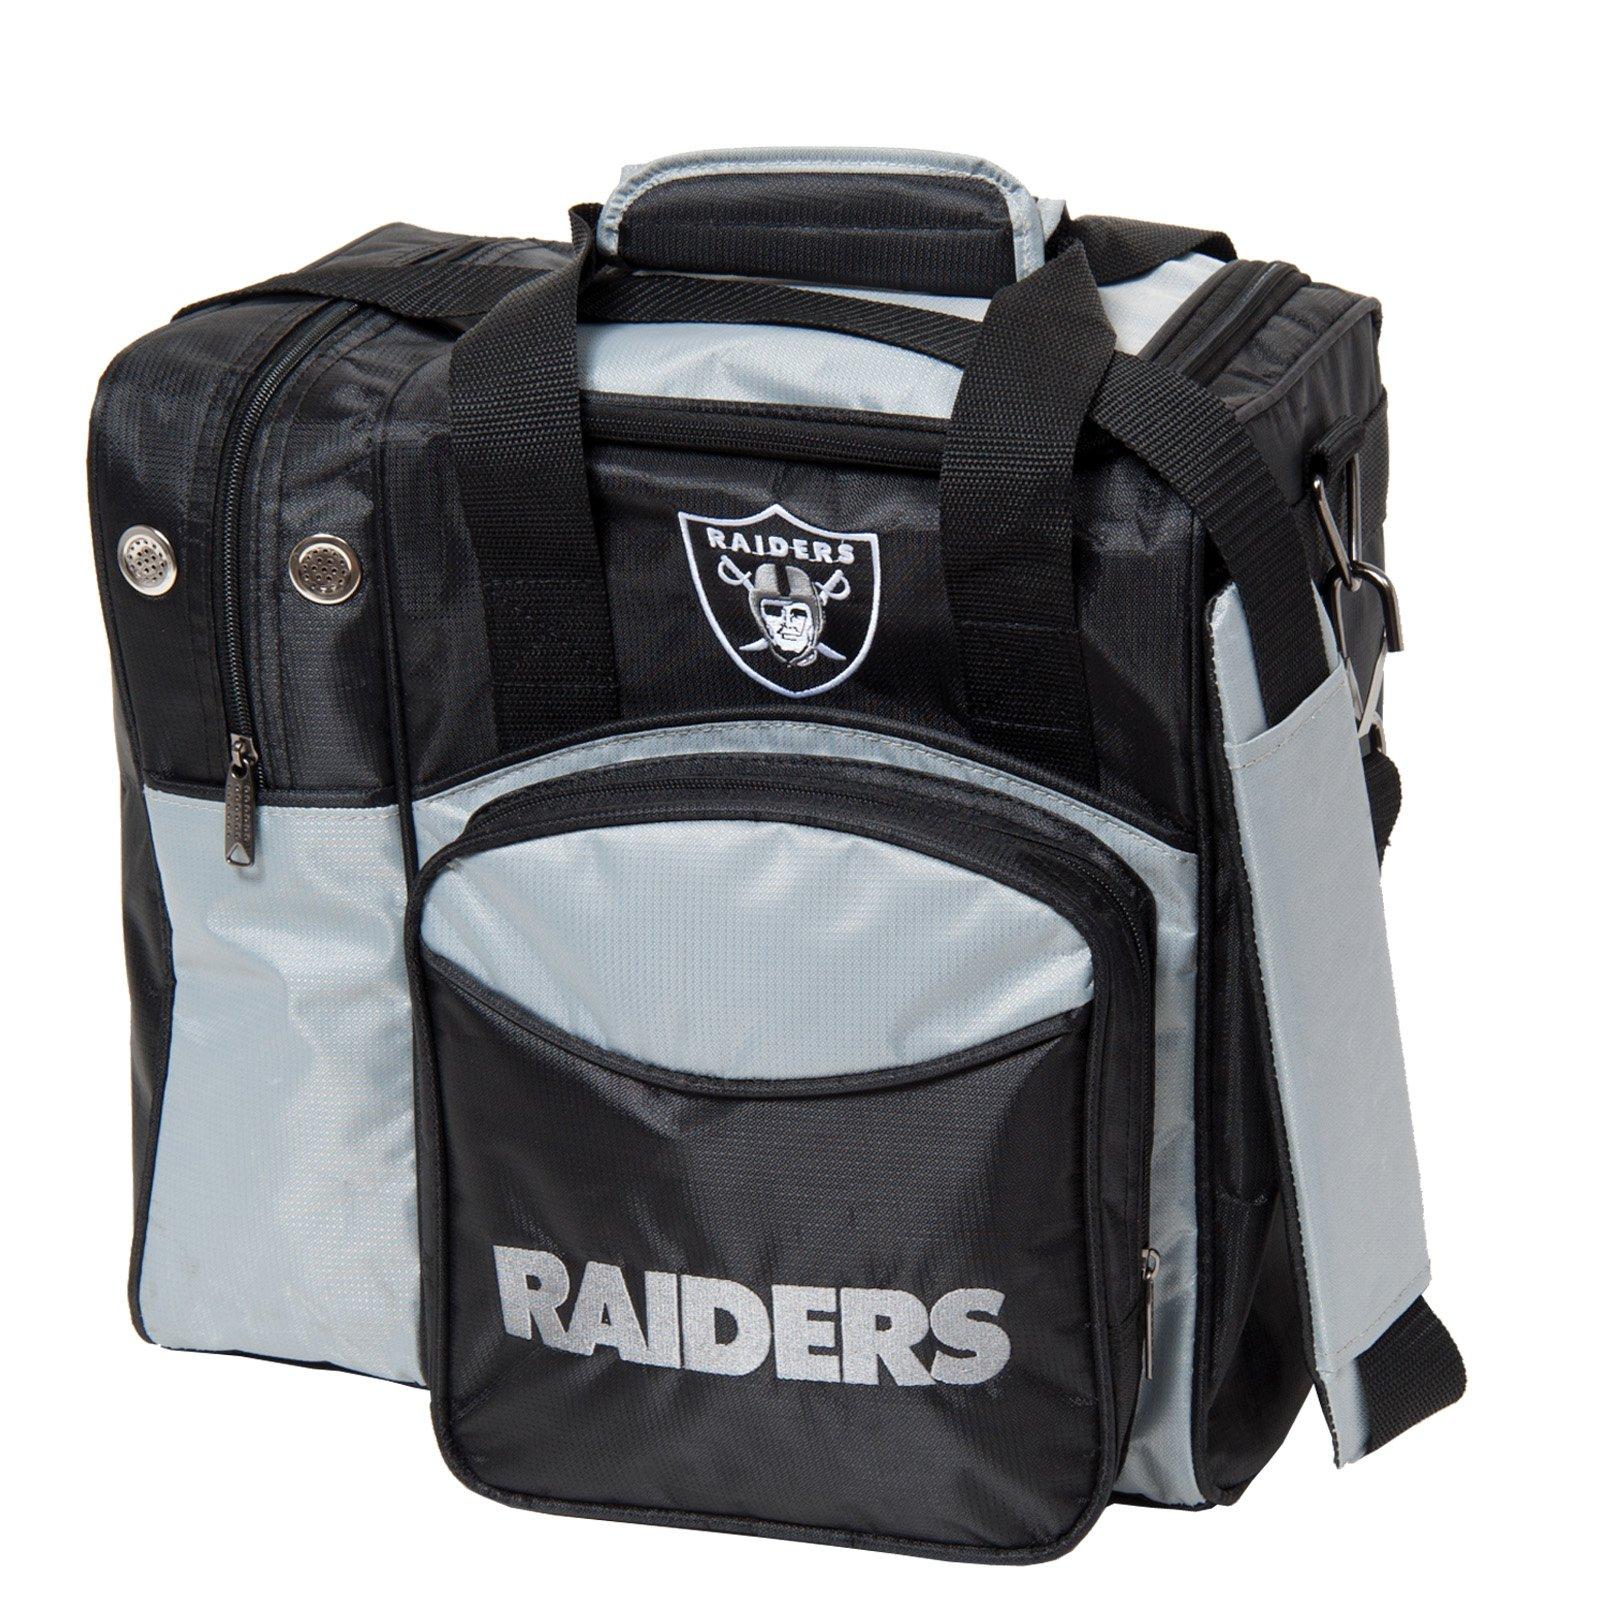 NFL Single Bag Oakland Raiders Bowling Ball Tote